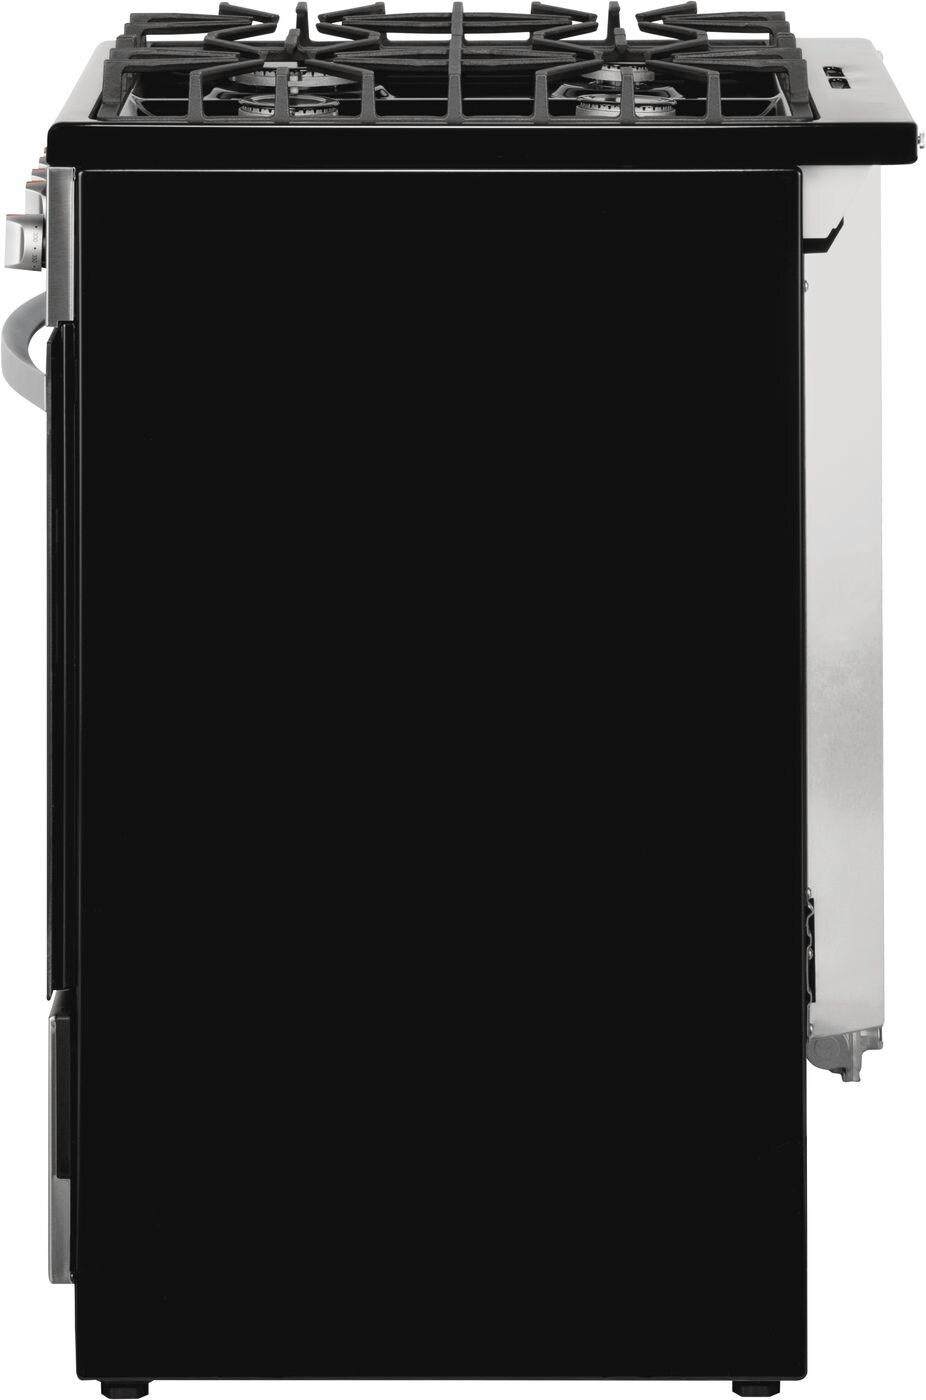 "Model: FFGH2422US | Frigidaire 24"" Front Control Freestanding Gas Range"